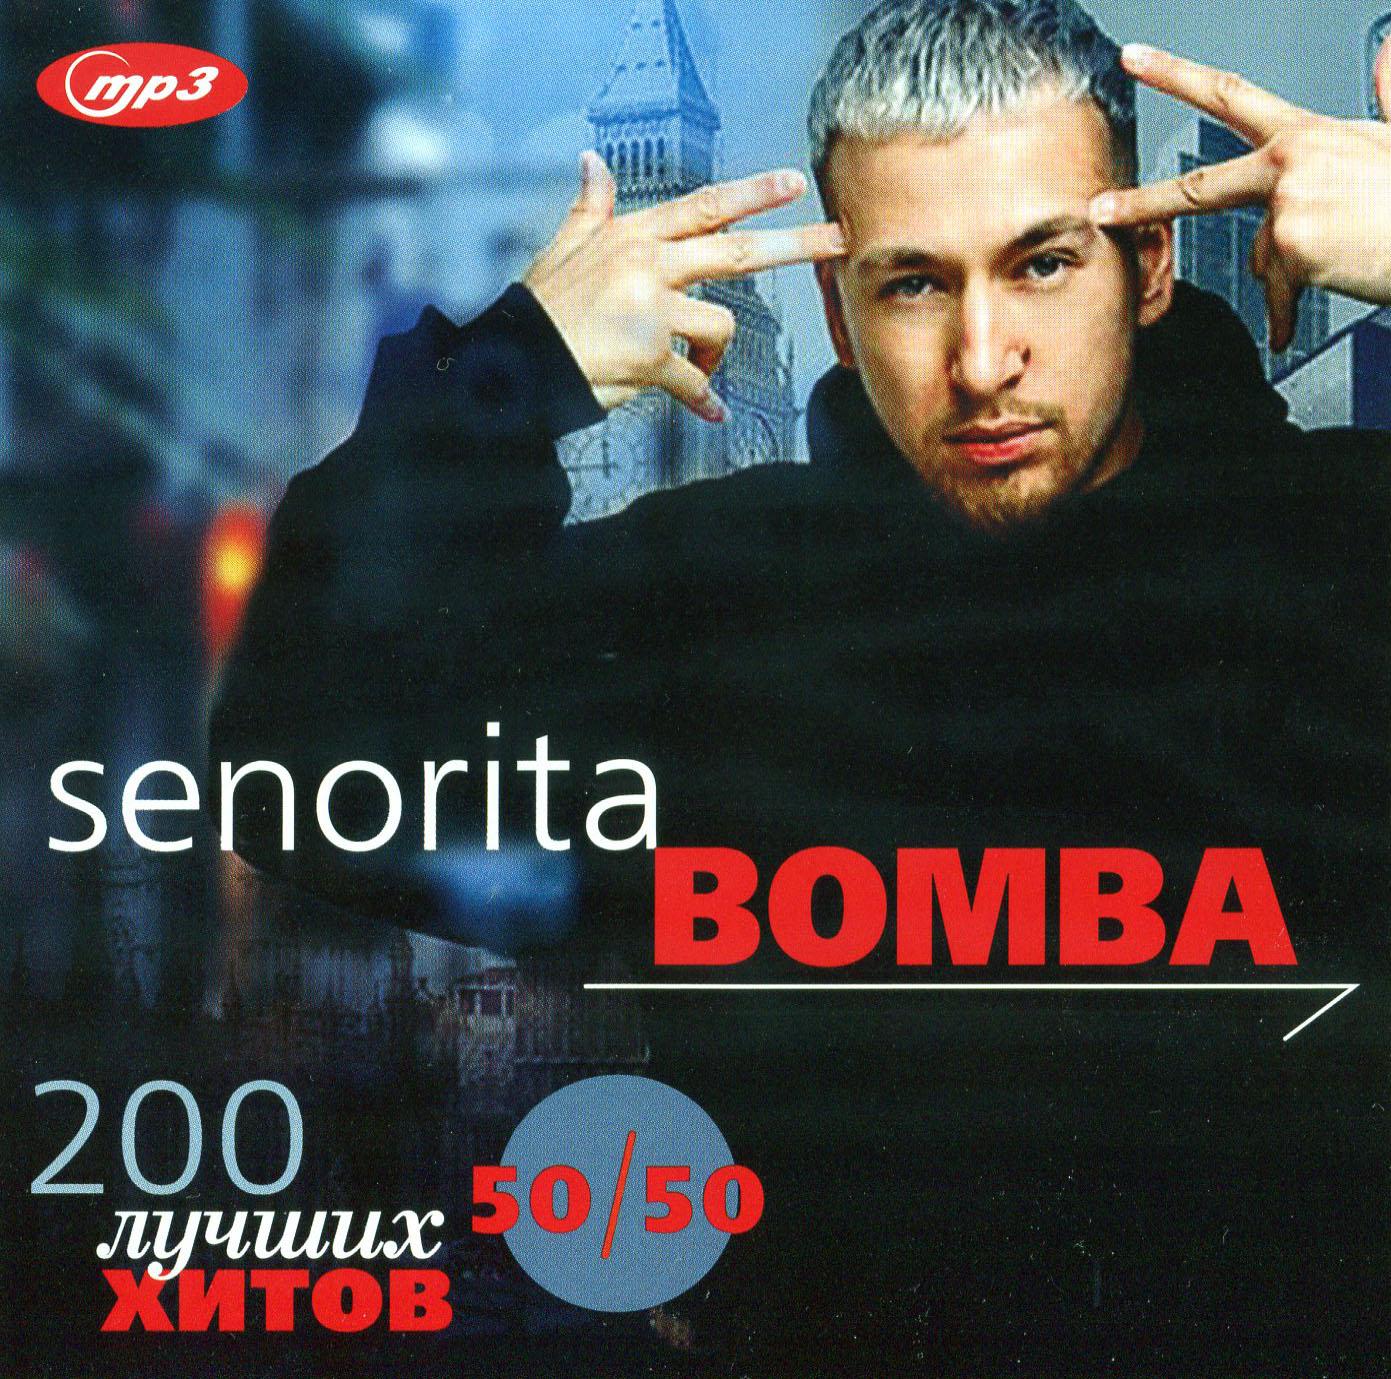 SENORITA BOMBA - 200 лучших хитов 50x50 [mp3]